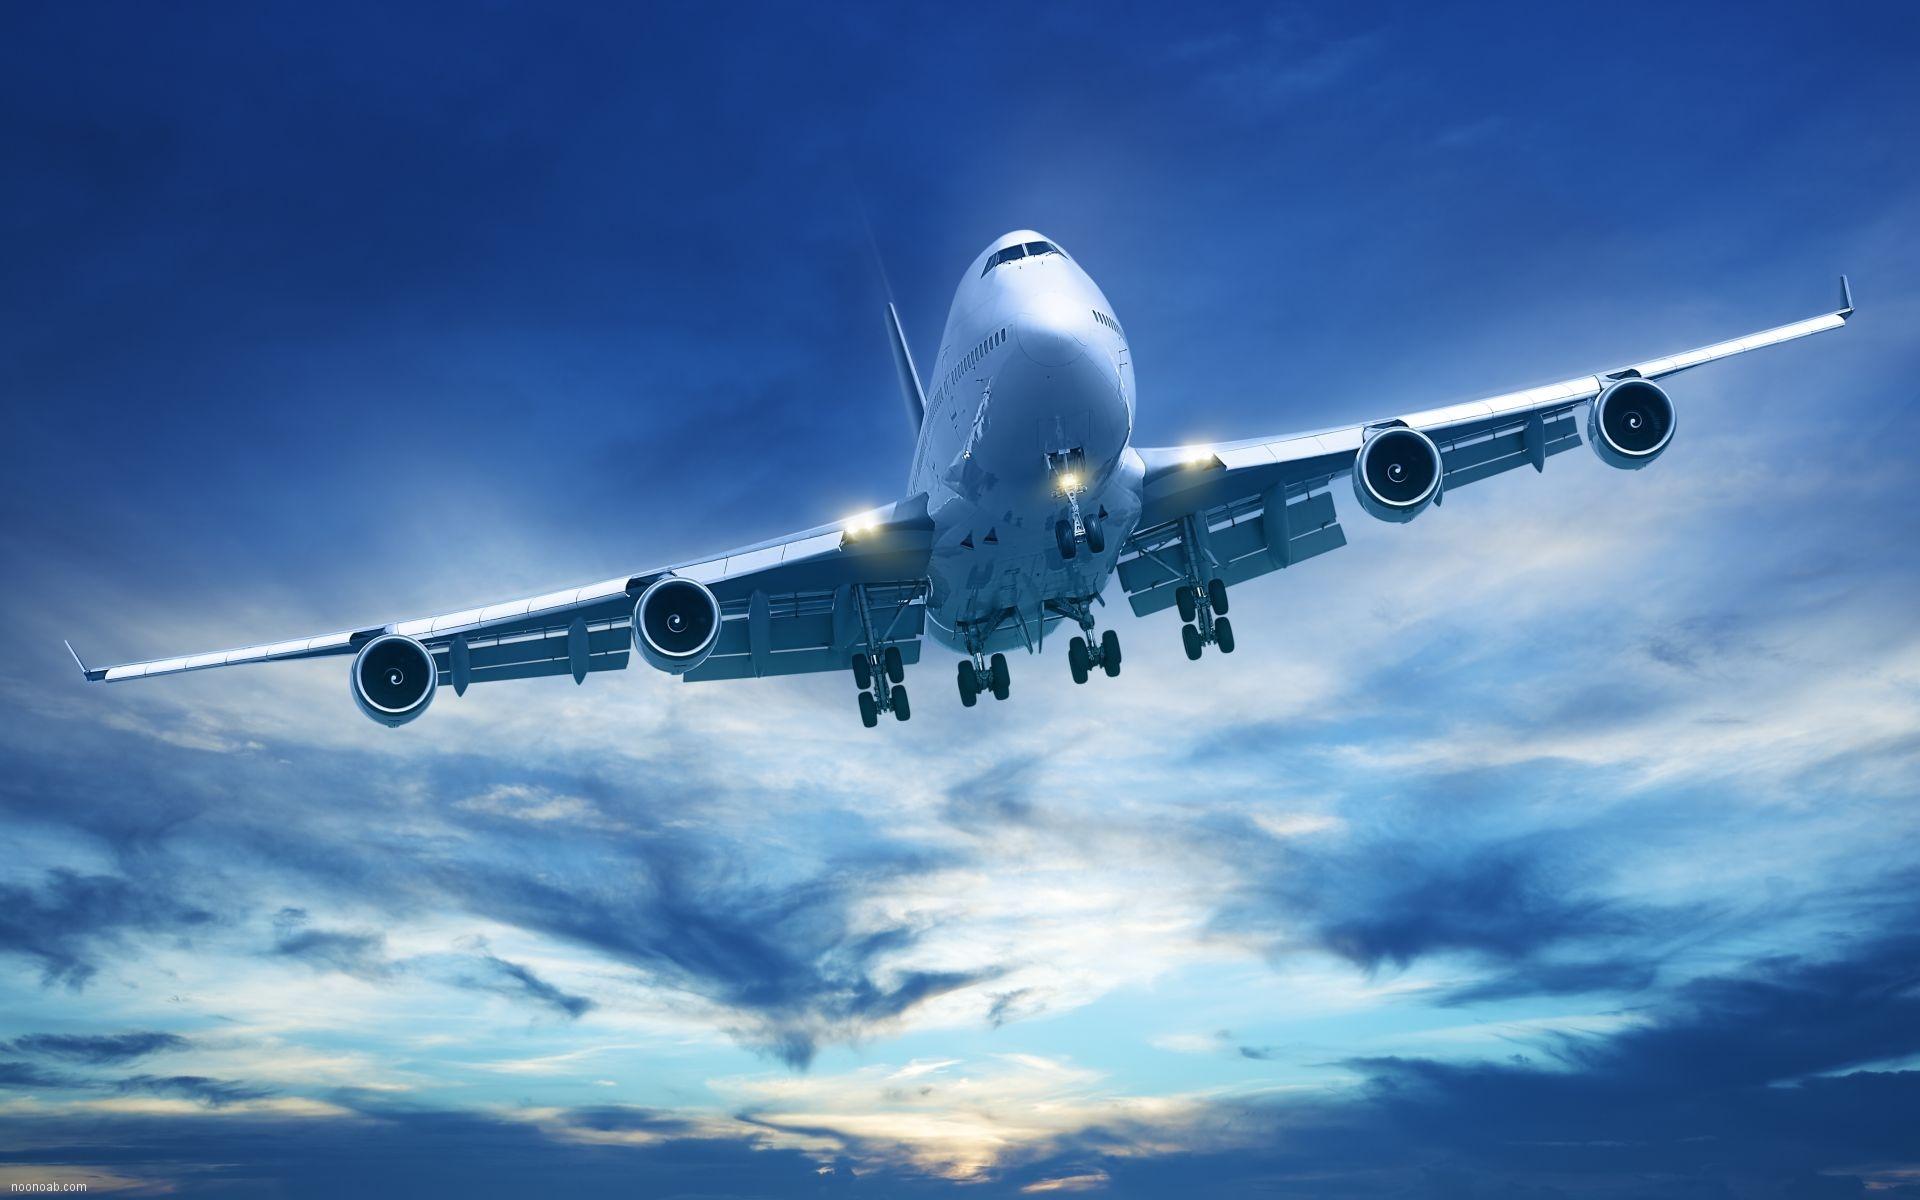 باشگاه خبرنگاران -نرخ بلیت هواپیما کیش ایر